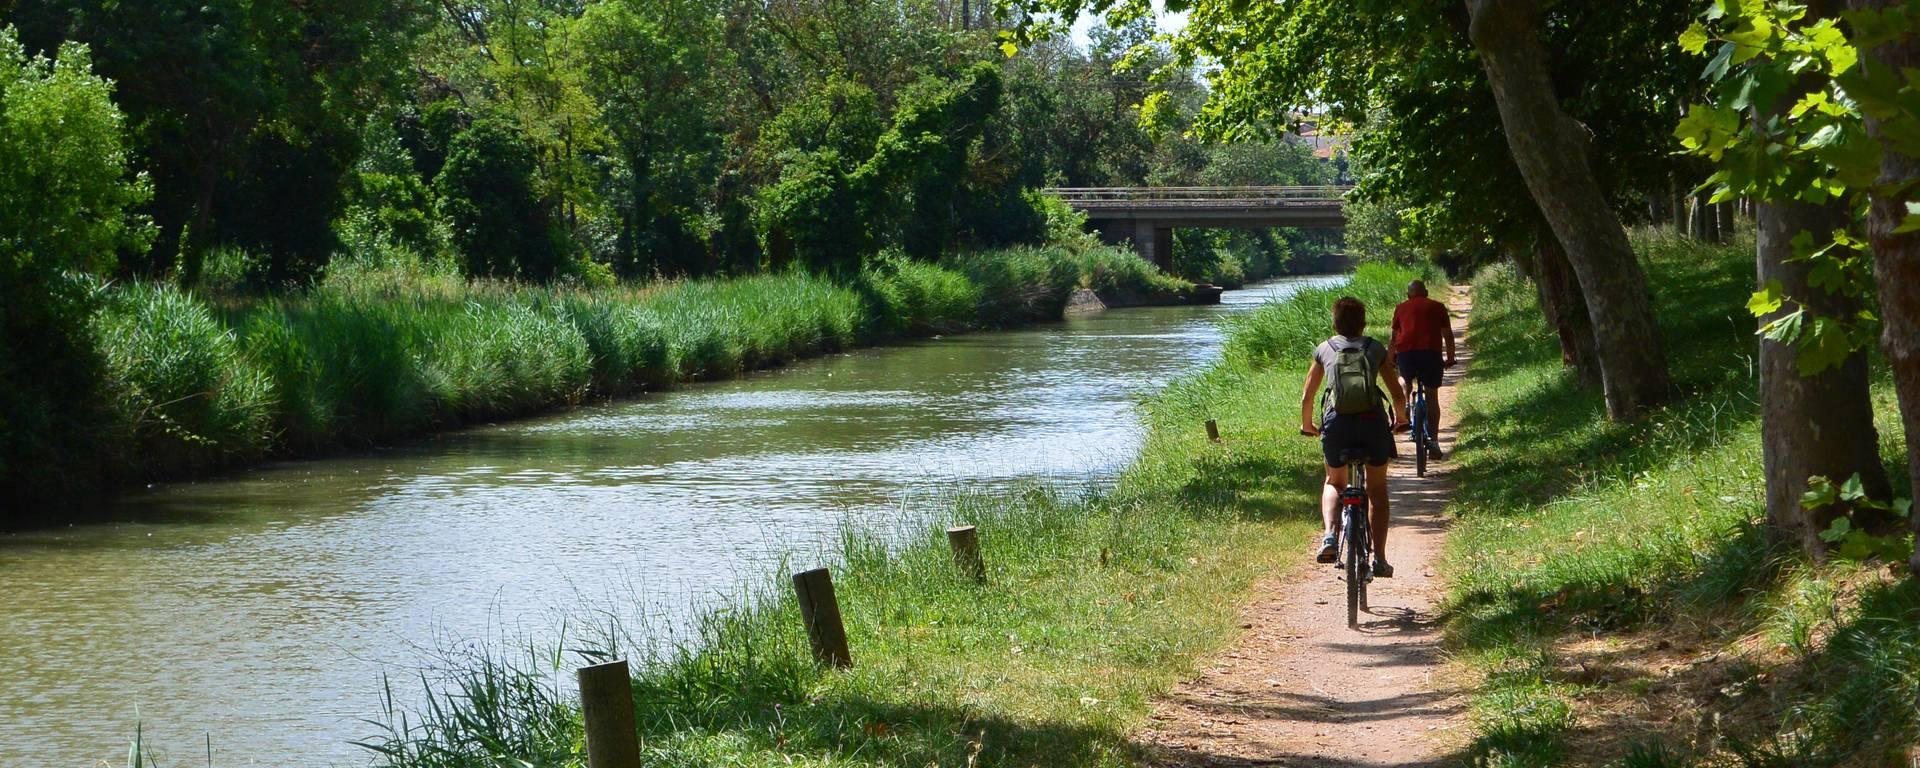 Vélo Canal du midi